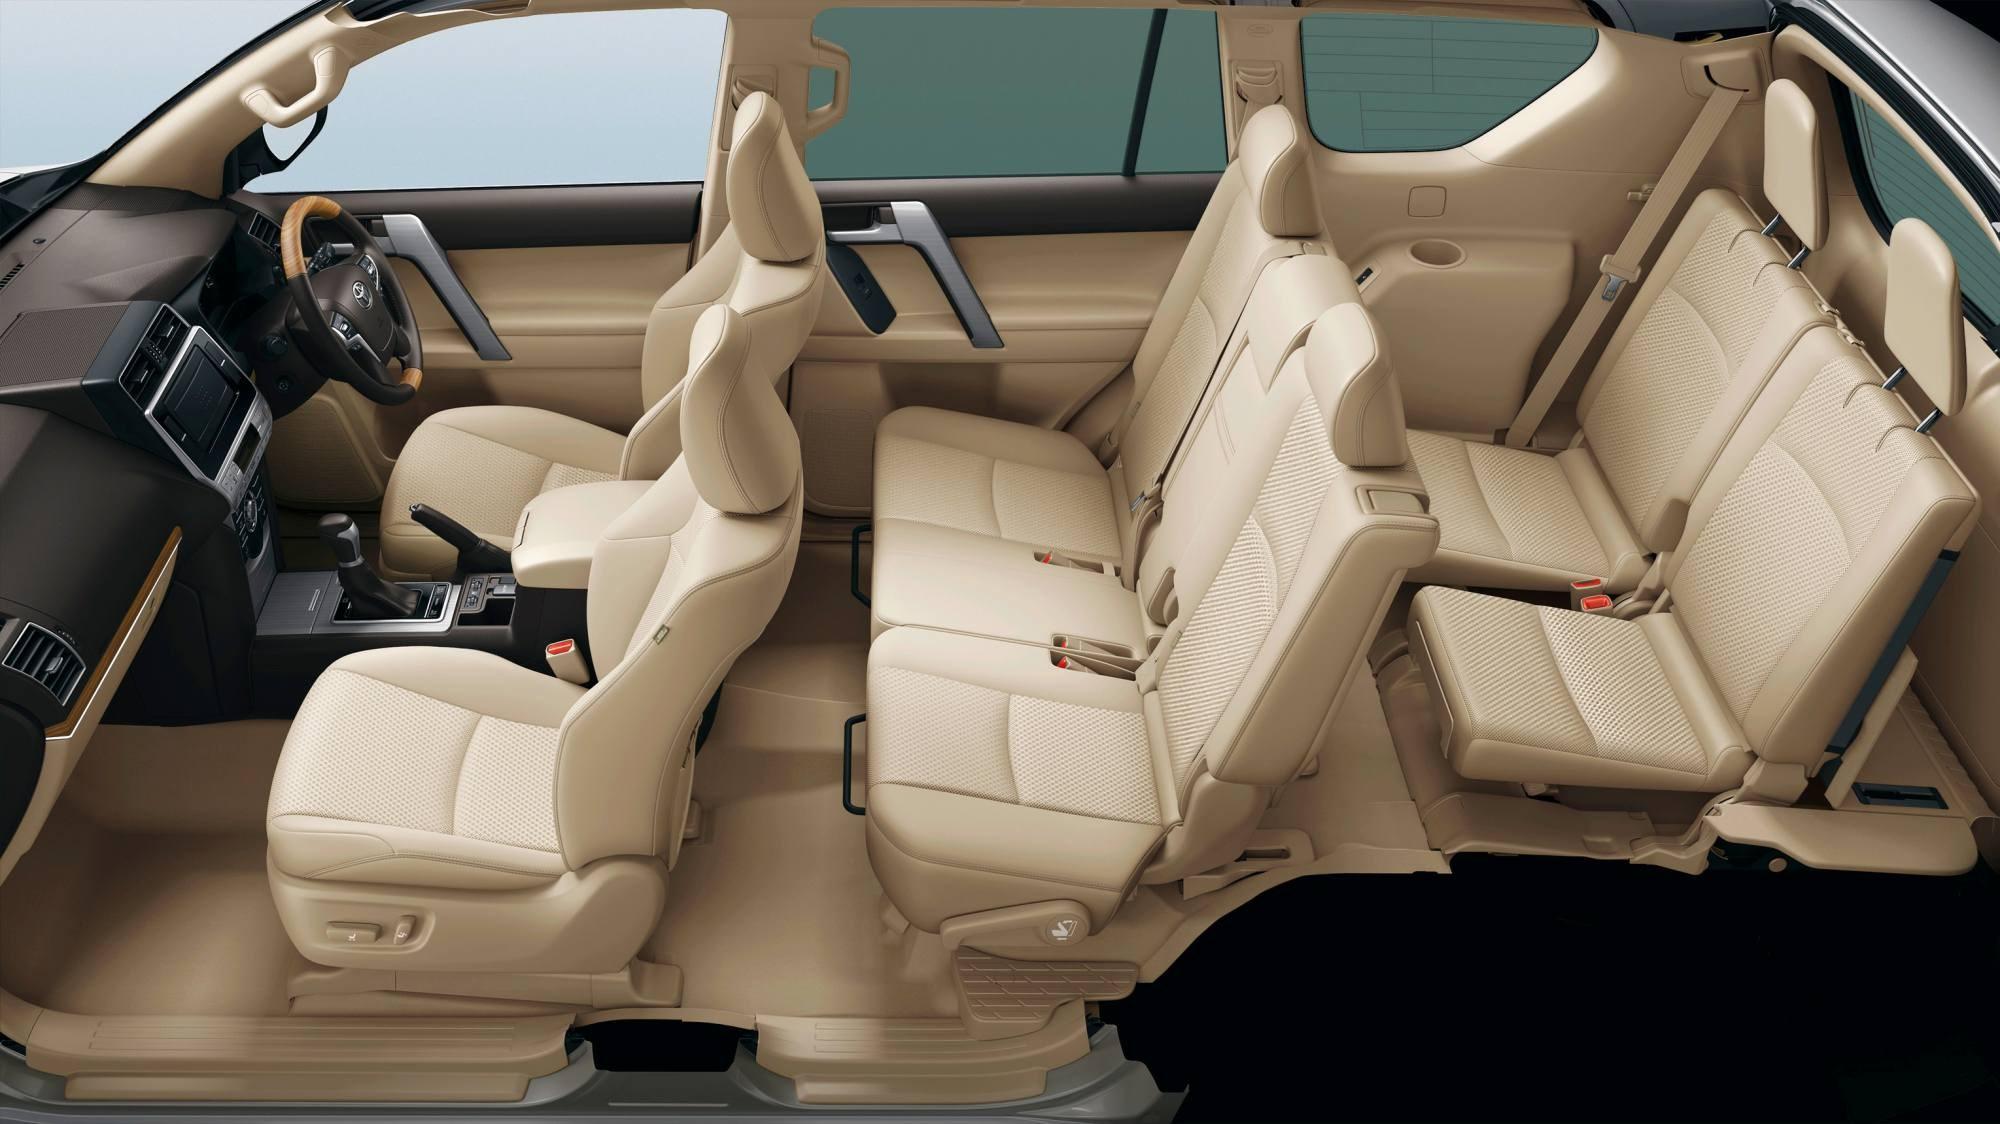 2018 toyota landcruiser sahara. 2018 Toyota Land Cruiser Prado Breaks Cover Landcruiser Sahara